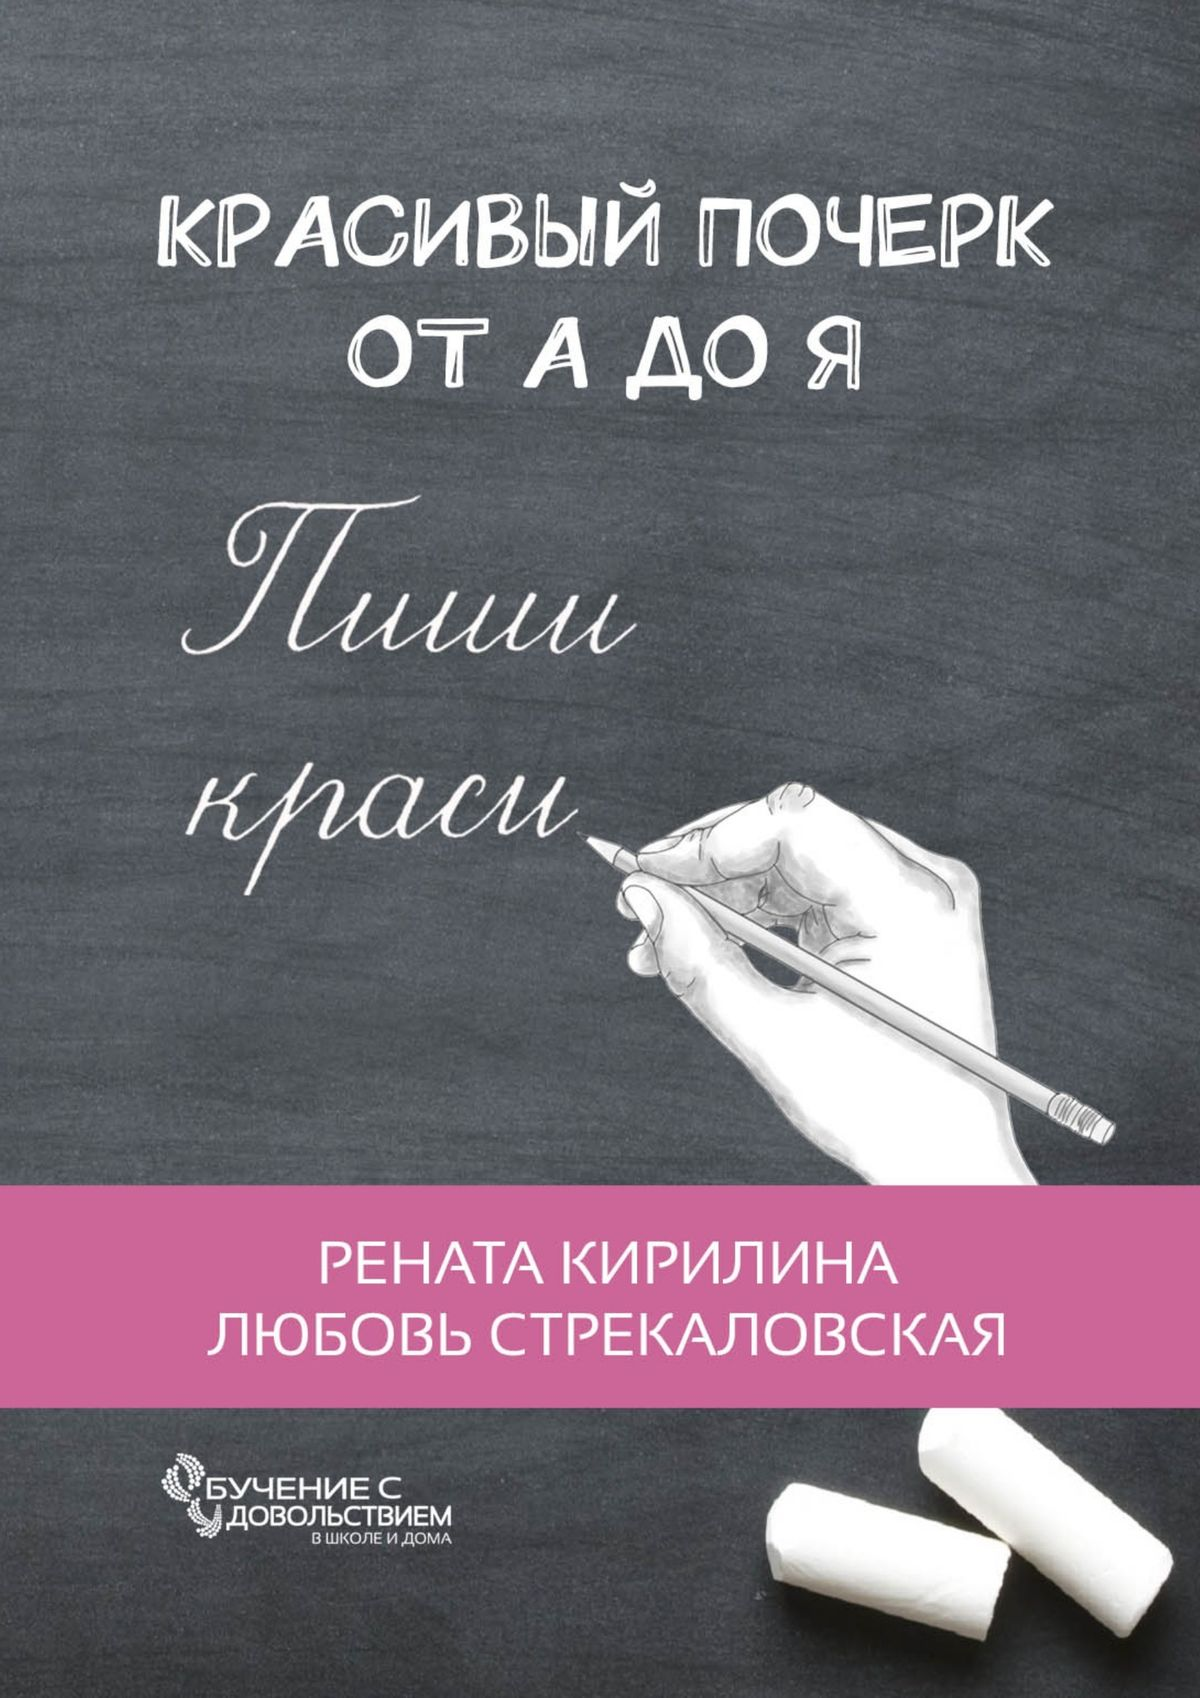 Рената Кирилина Красивый почерк от А до Я. Обучение судовольствием сегал м почерк